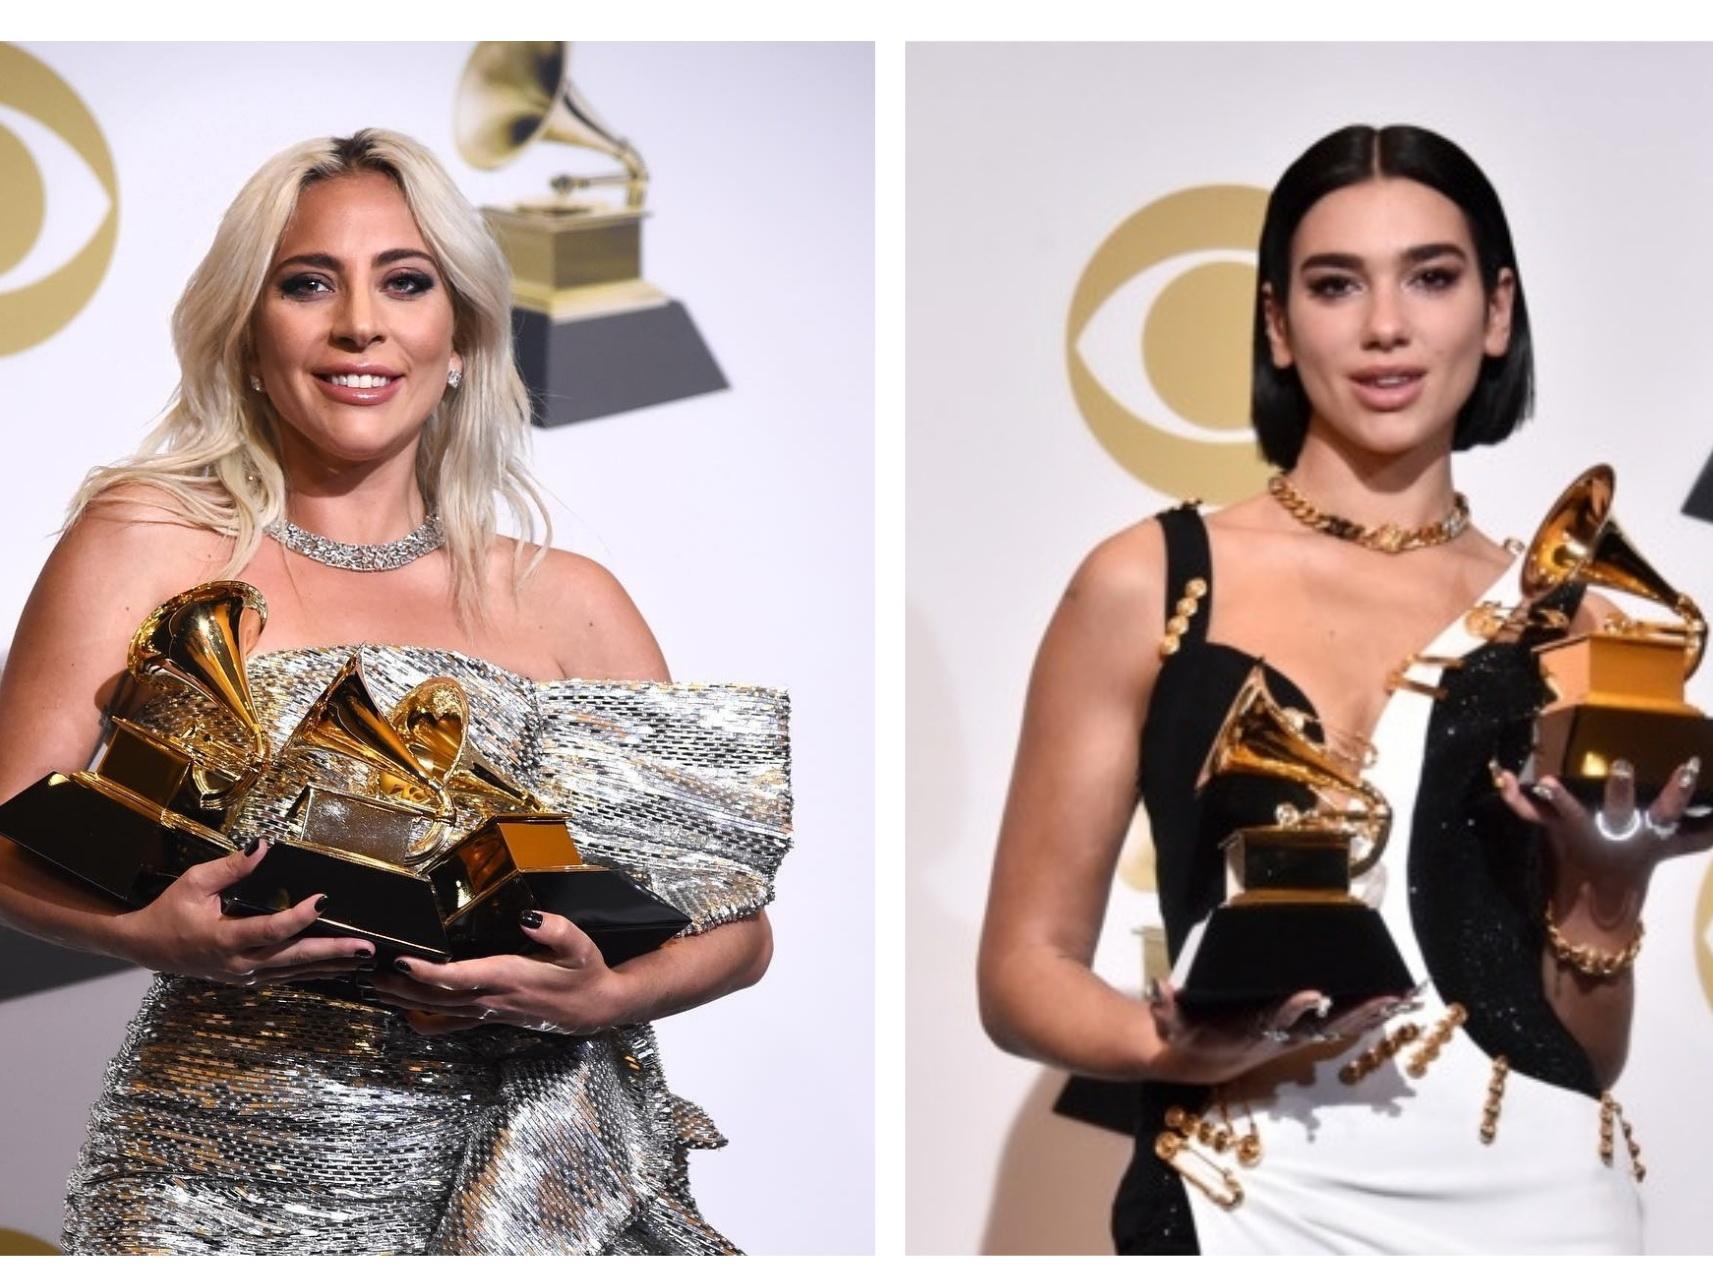 Леди Гага, Дуа Липа и другие лауреаты премии «Грэмми-2019» - ФОТО – ВИДЕО